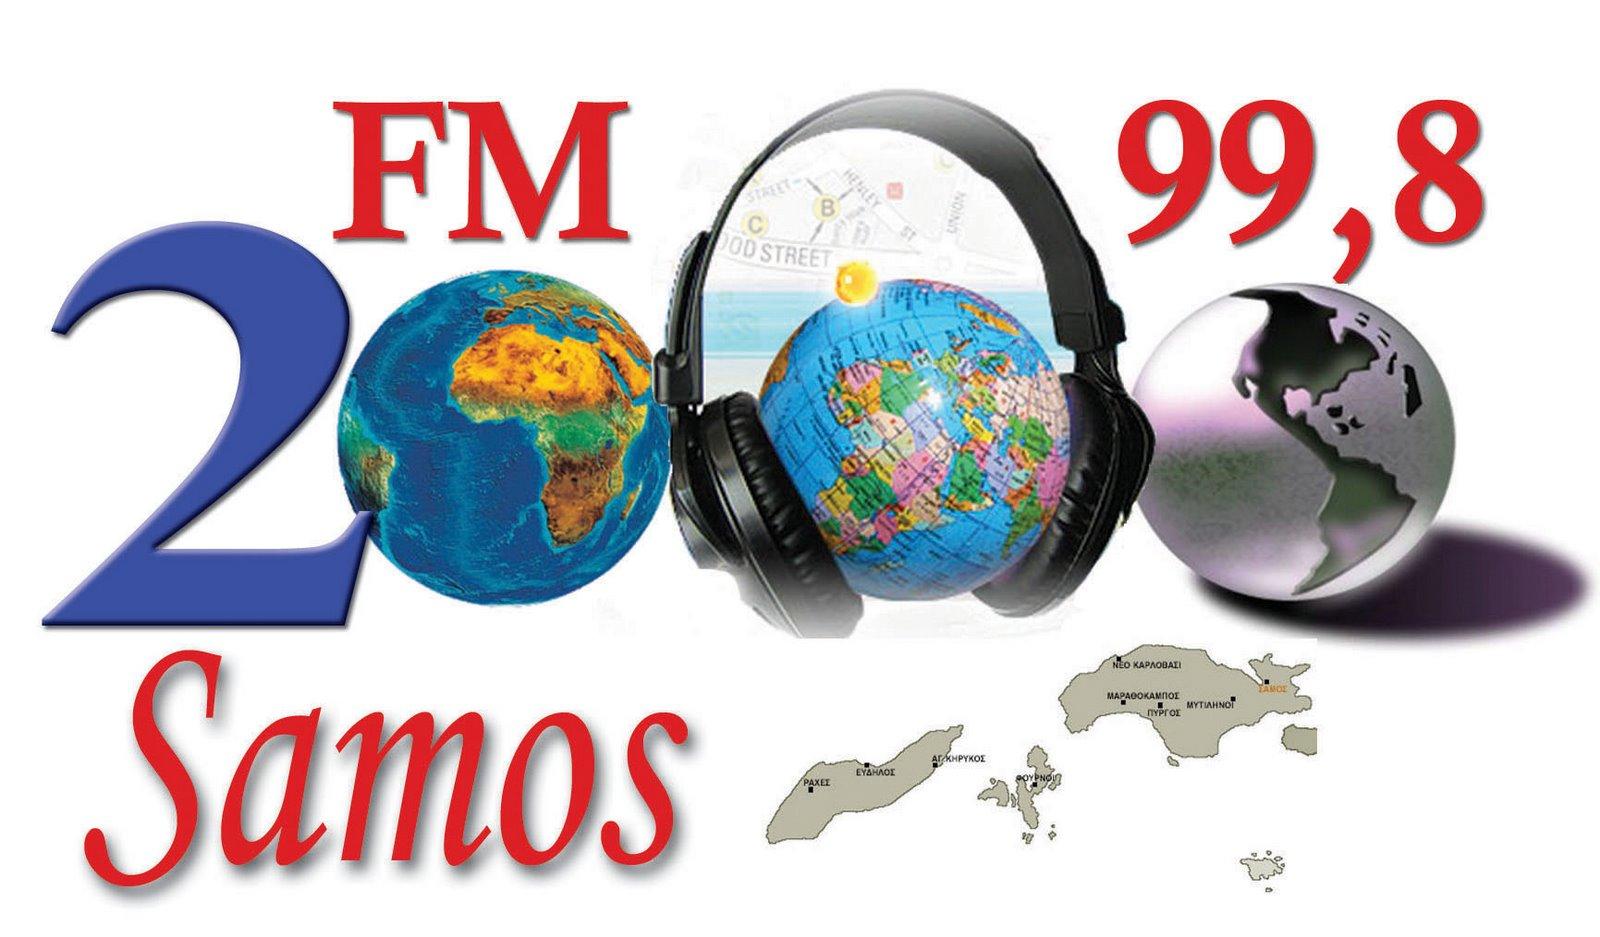 2000 fm RADIO 99,8 SAMOS